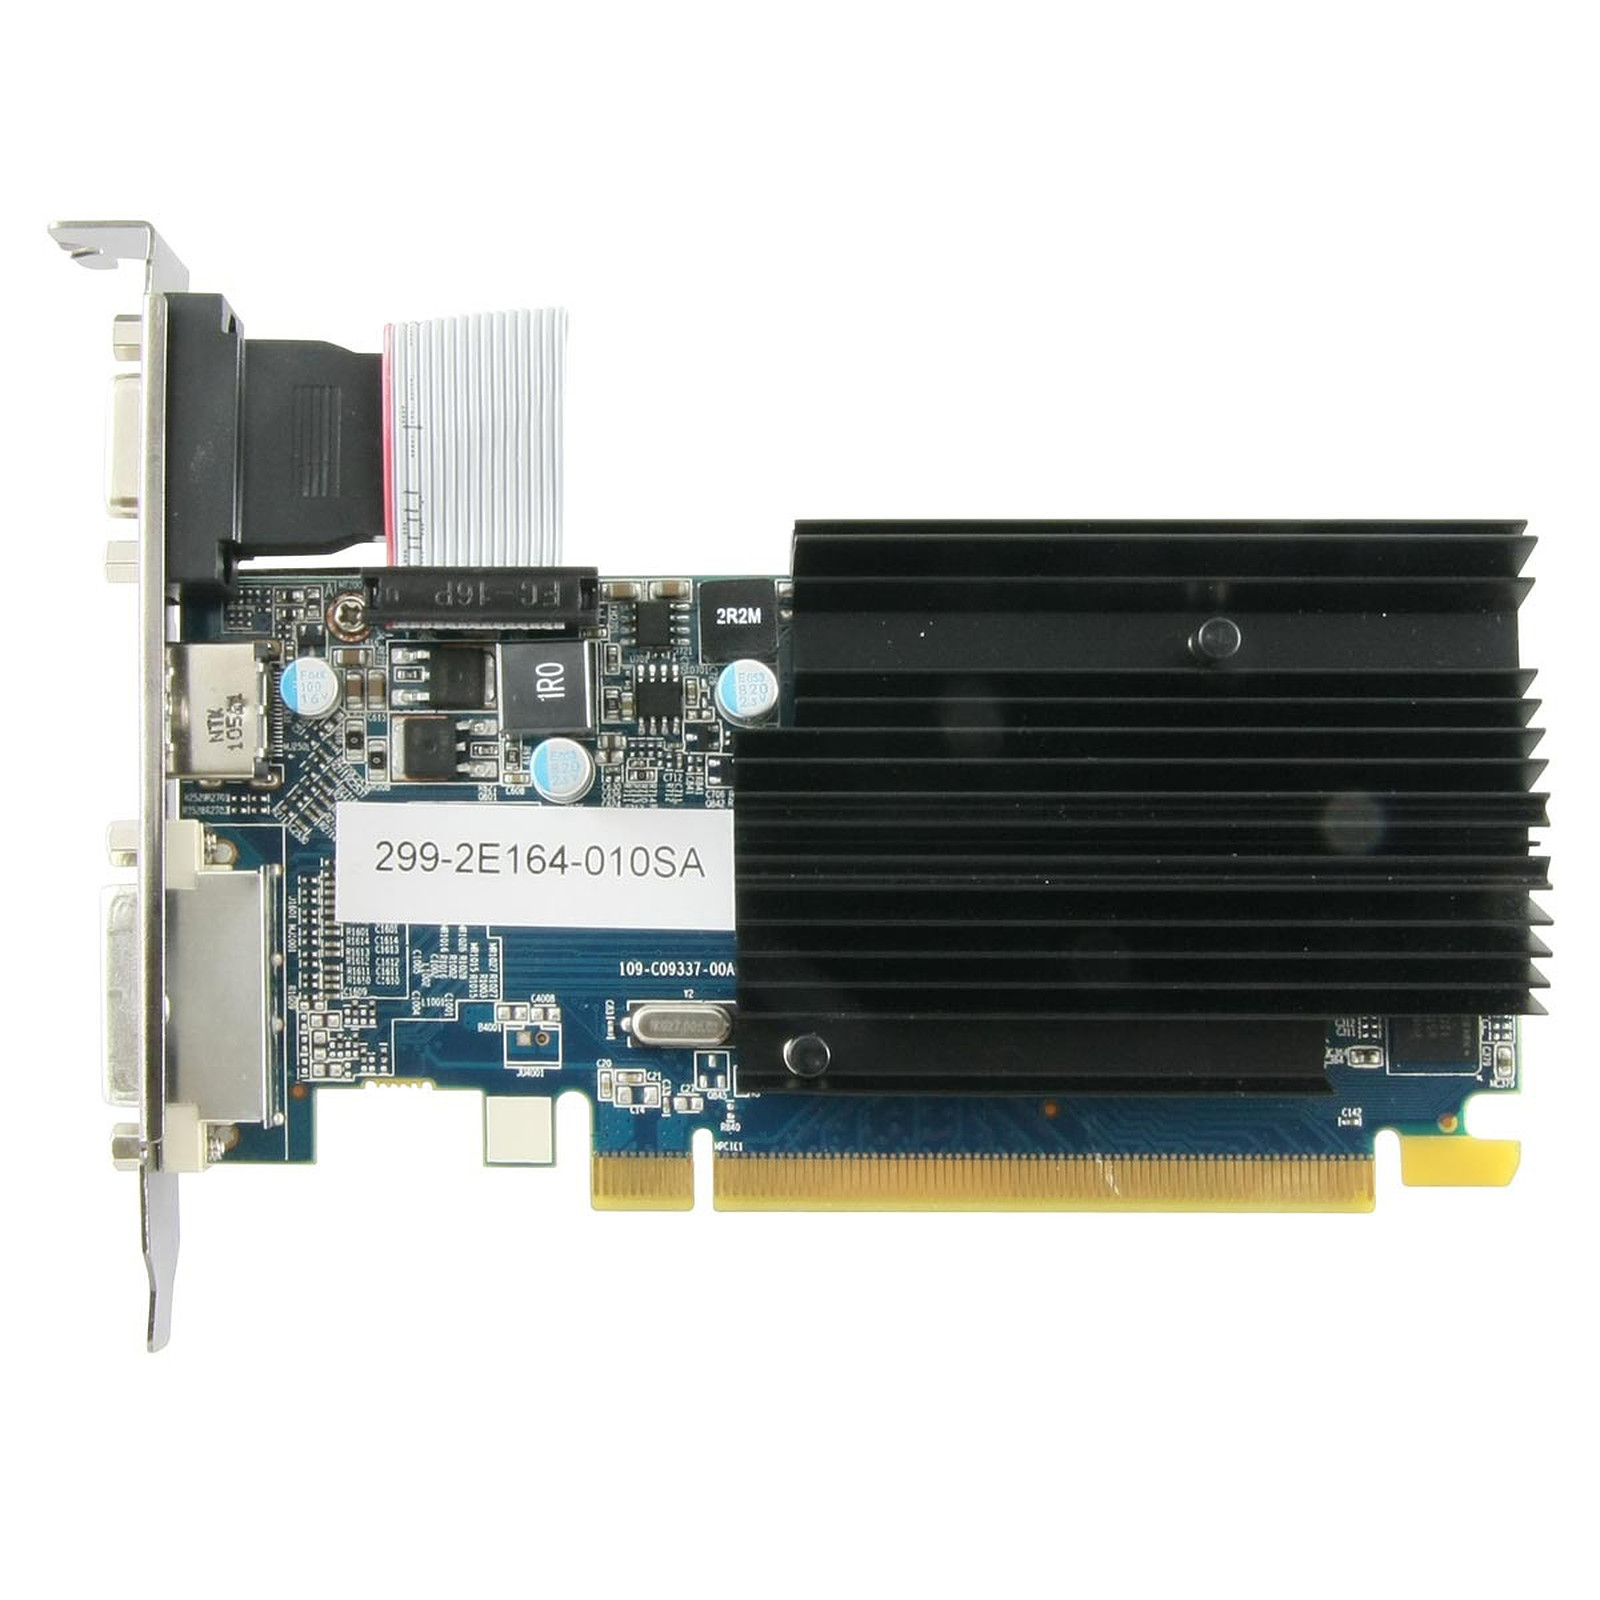 Sapphire Radeon HD 6450 1 GB DDR3 · Occasion